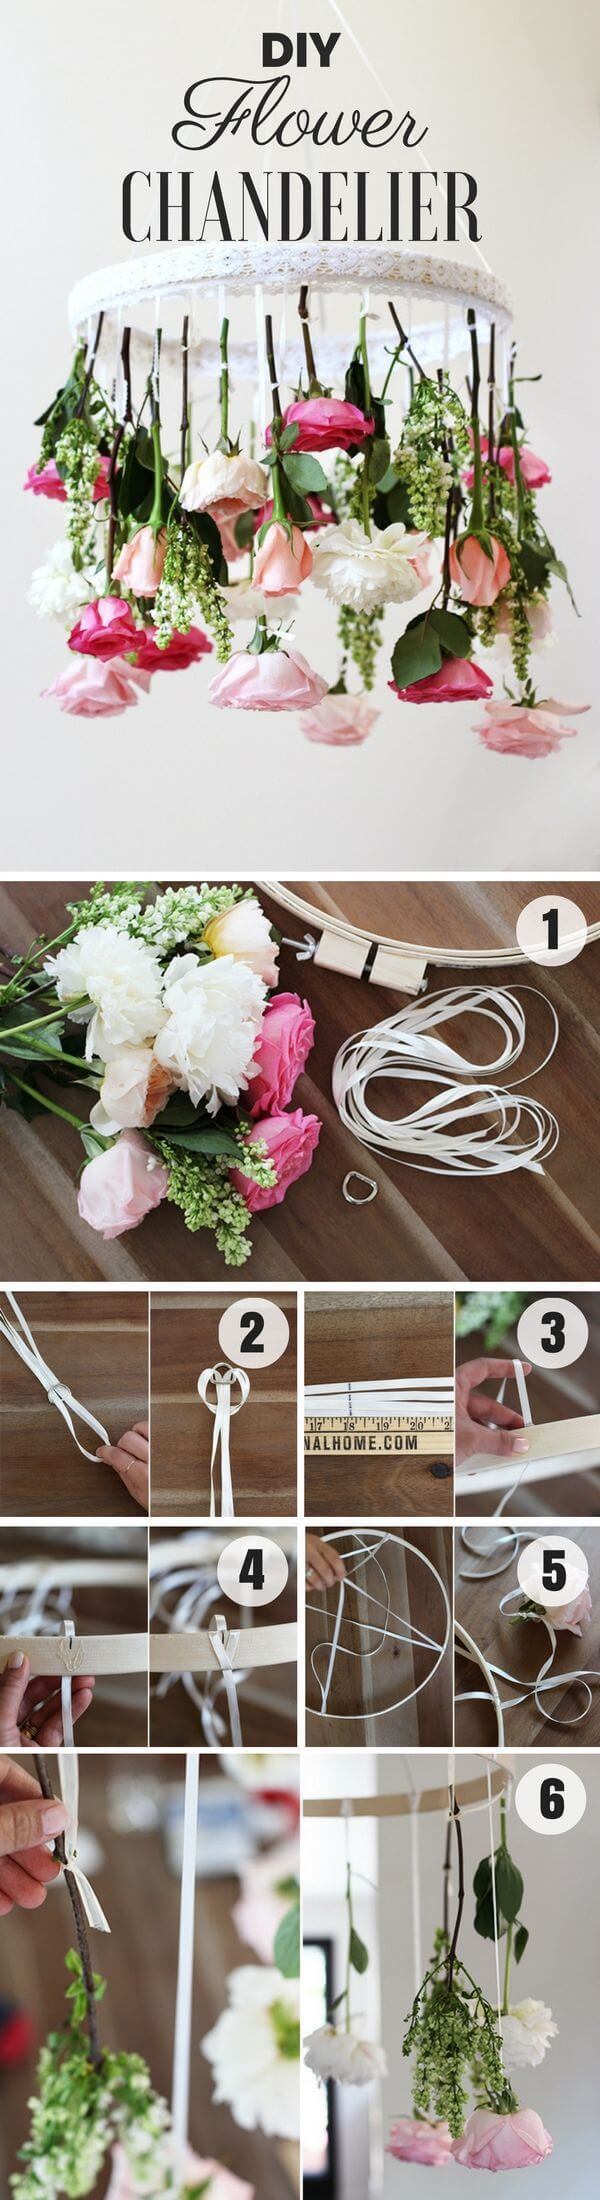 DIY Fresh Flower Chandelier